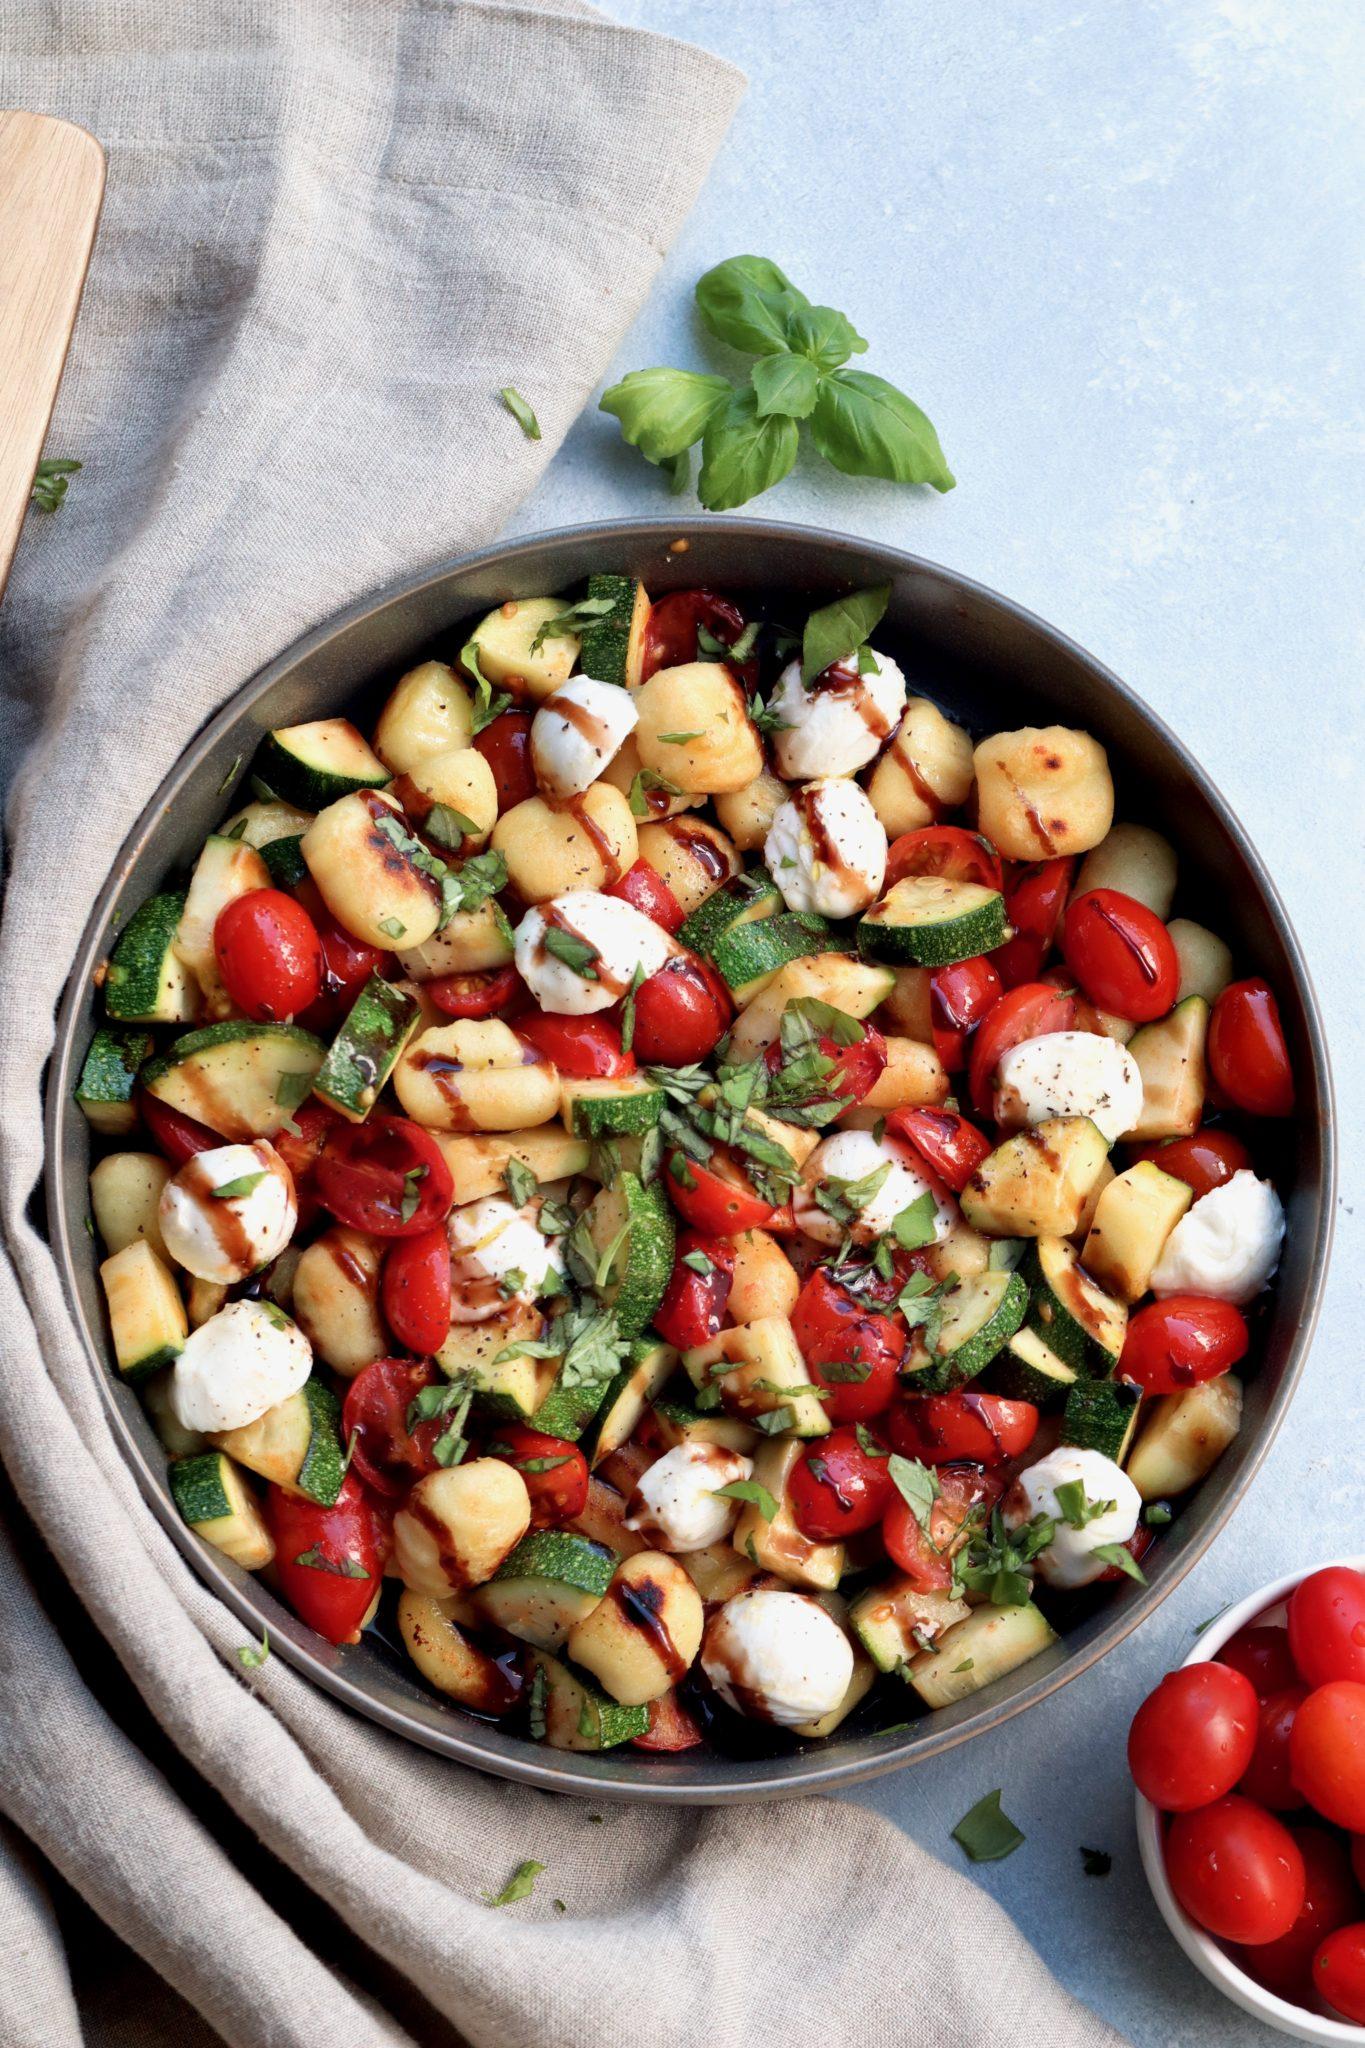 caprese-style skillet gnocchi // cait's plate